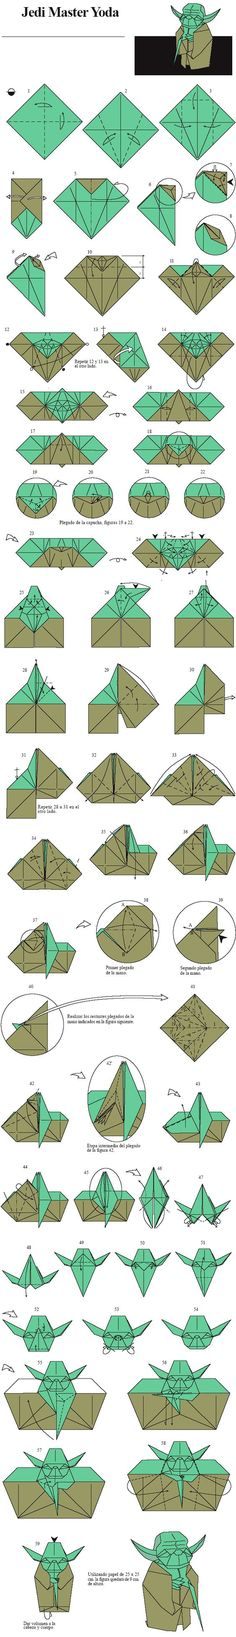 Origami Jedi Master Yoda // Designed by Fumiaki Kawahata: